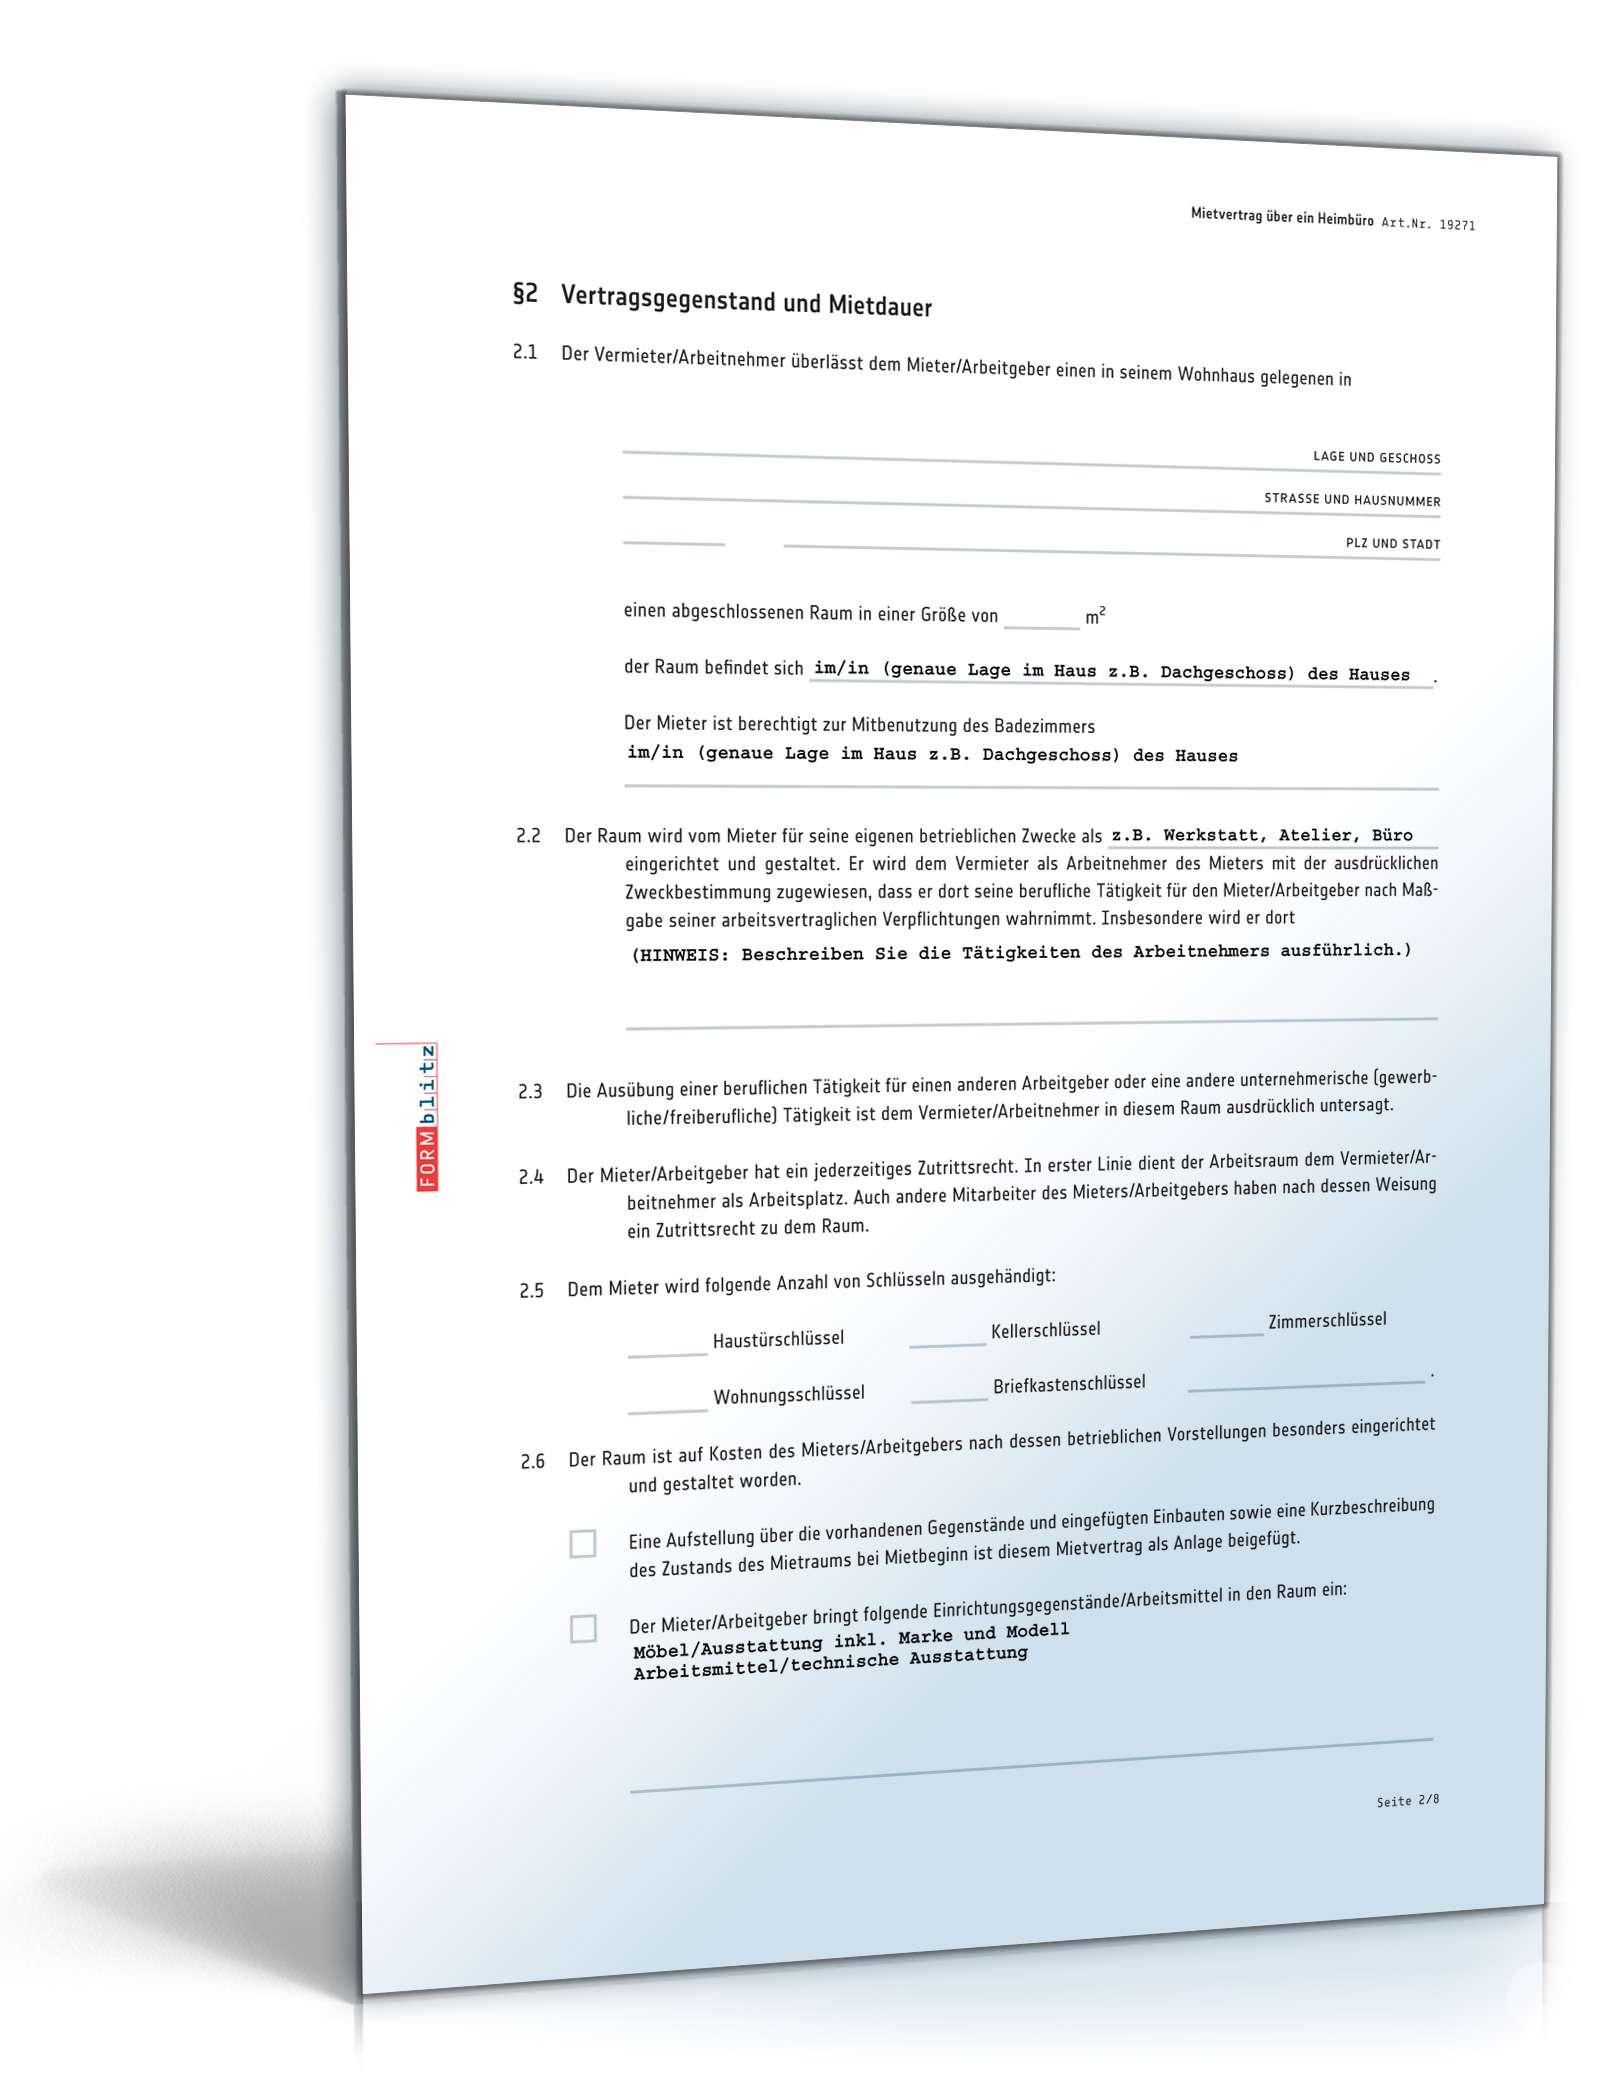 heimbuero mietvertrag muster - Schlussel Empfangsbestatigung Muster